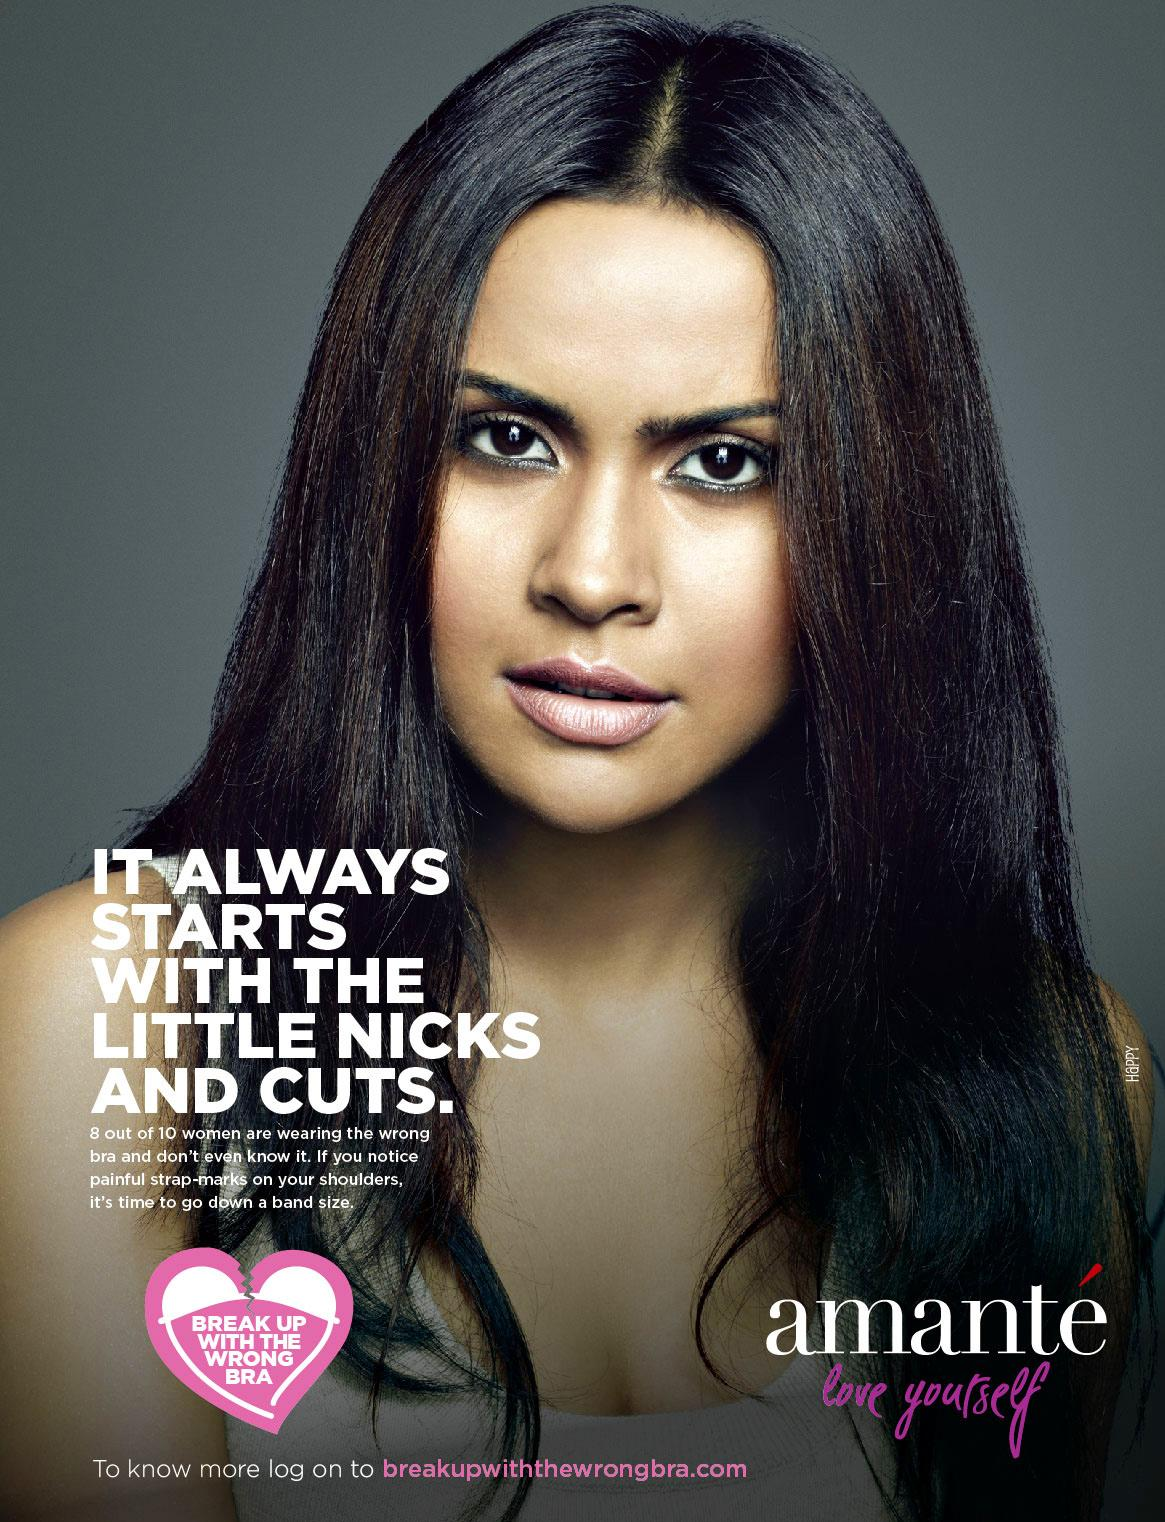 Amanté Print Ad -  Break up the wrong bra, 4